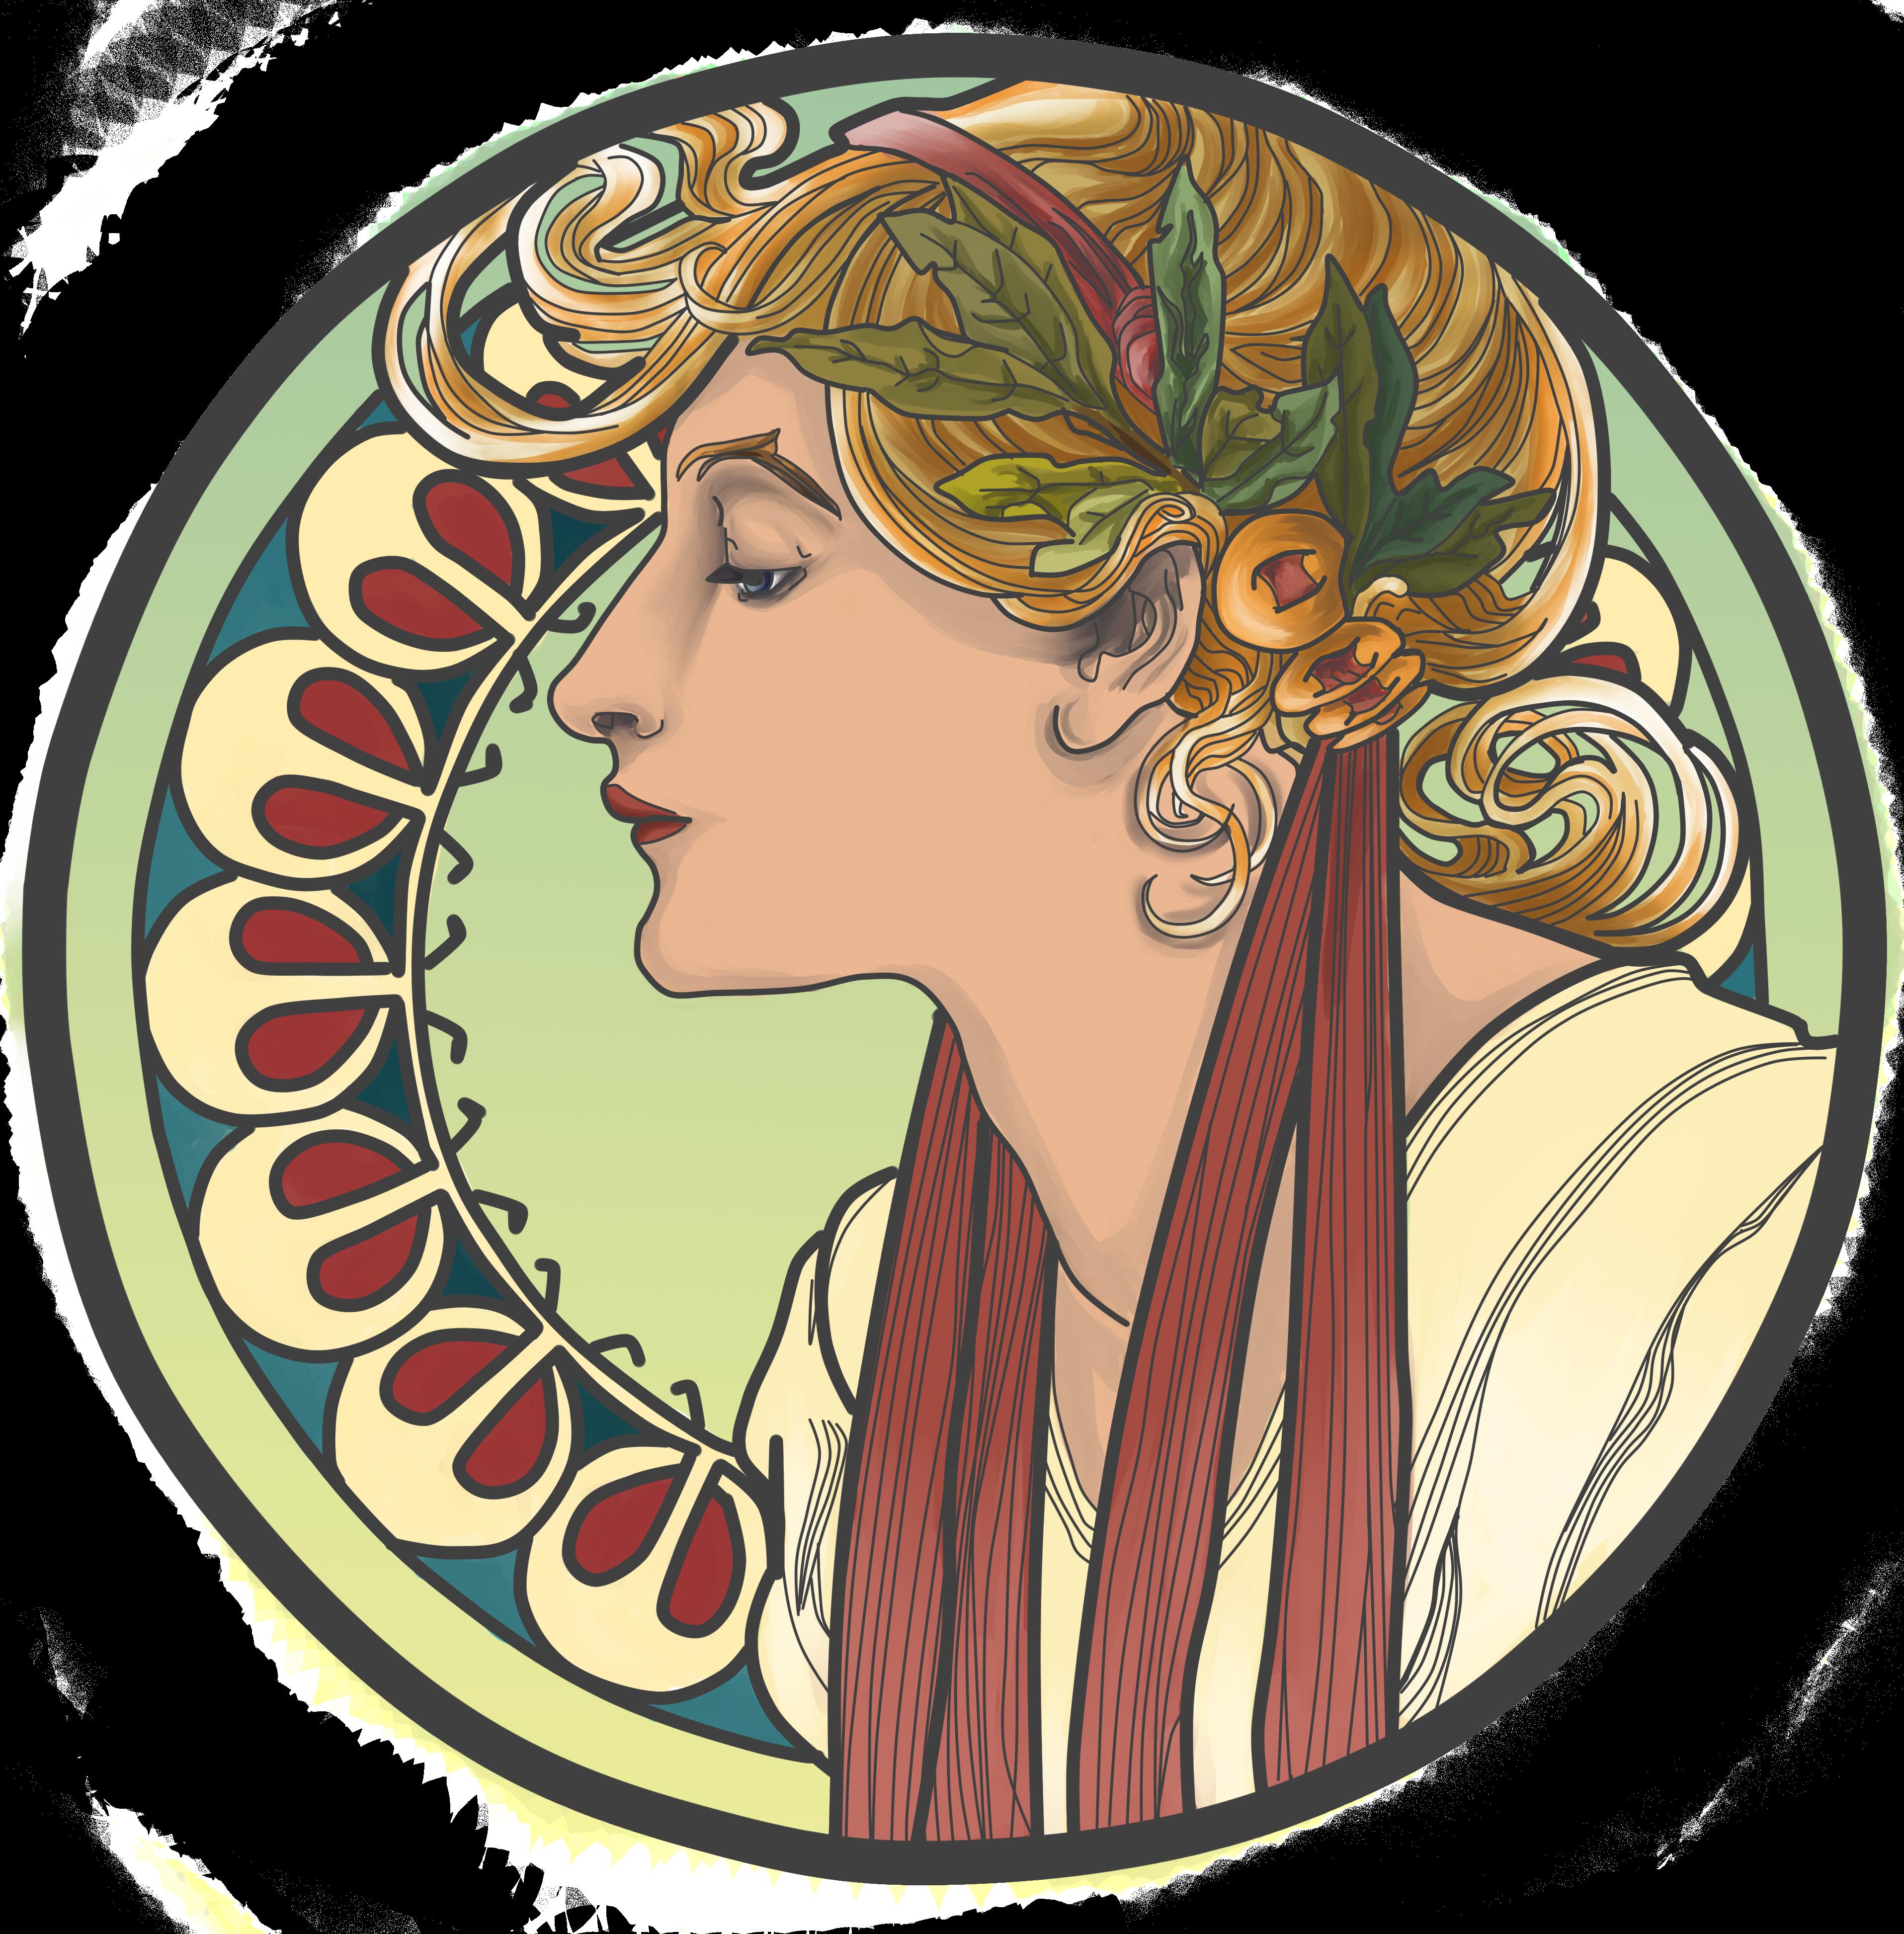 Art Nouveau - Year 11 Visual Arts